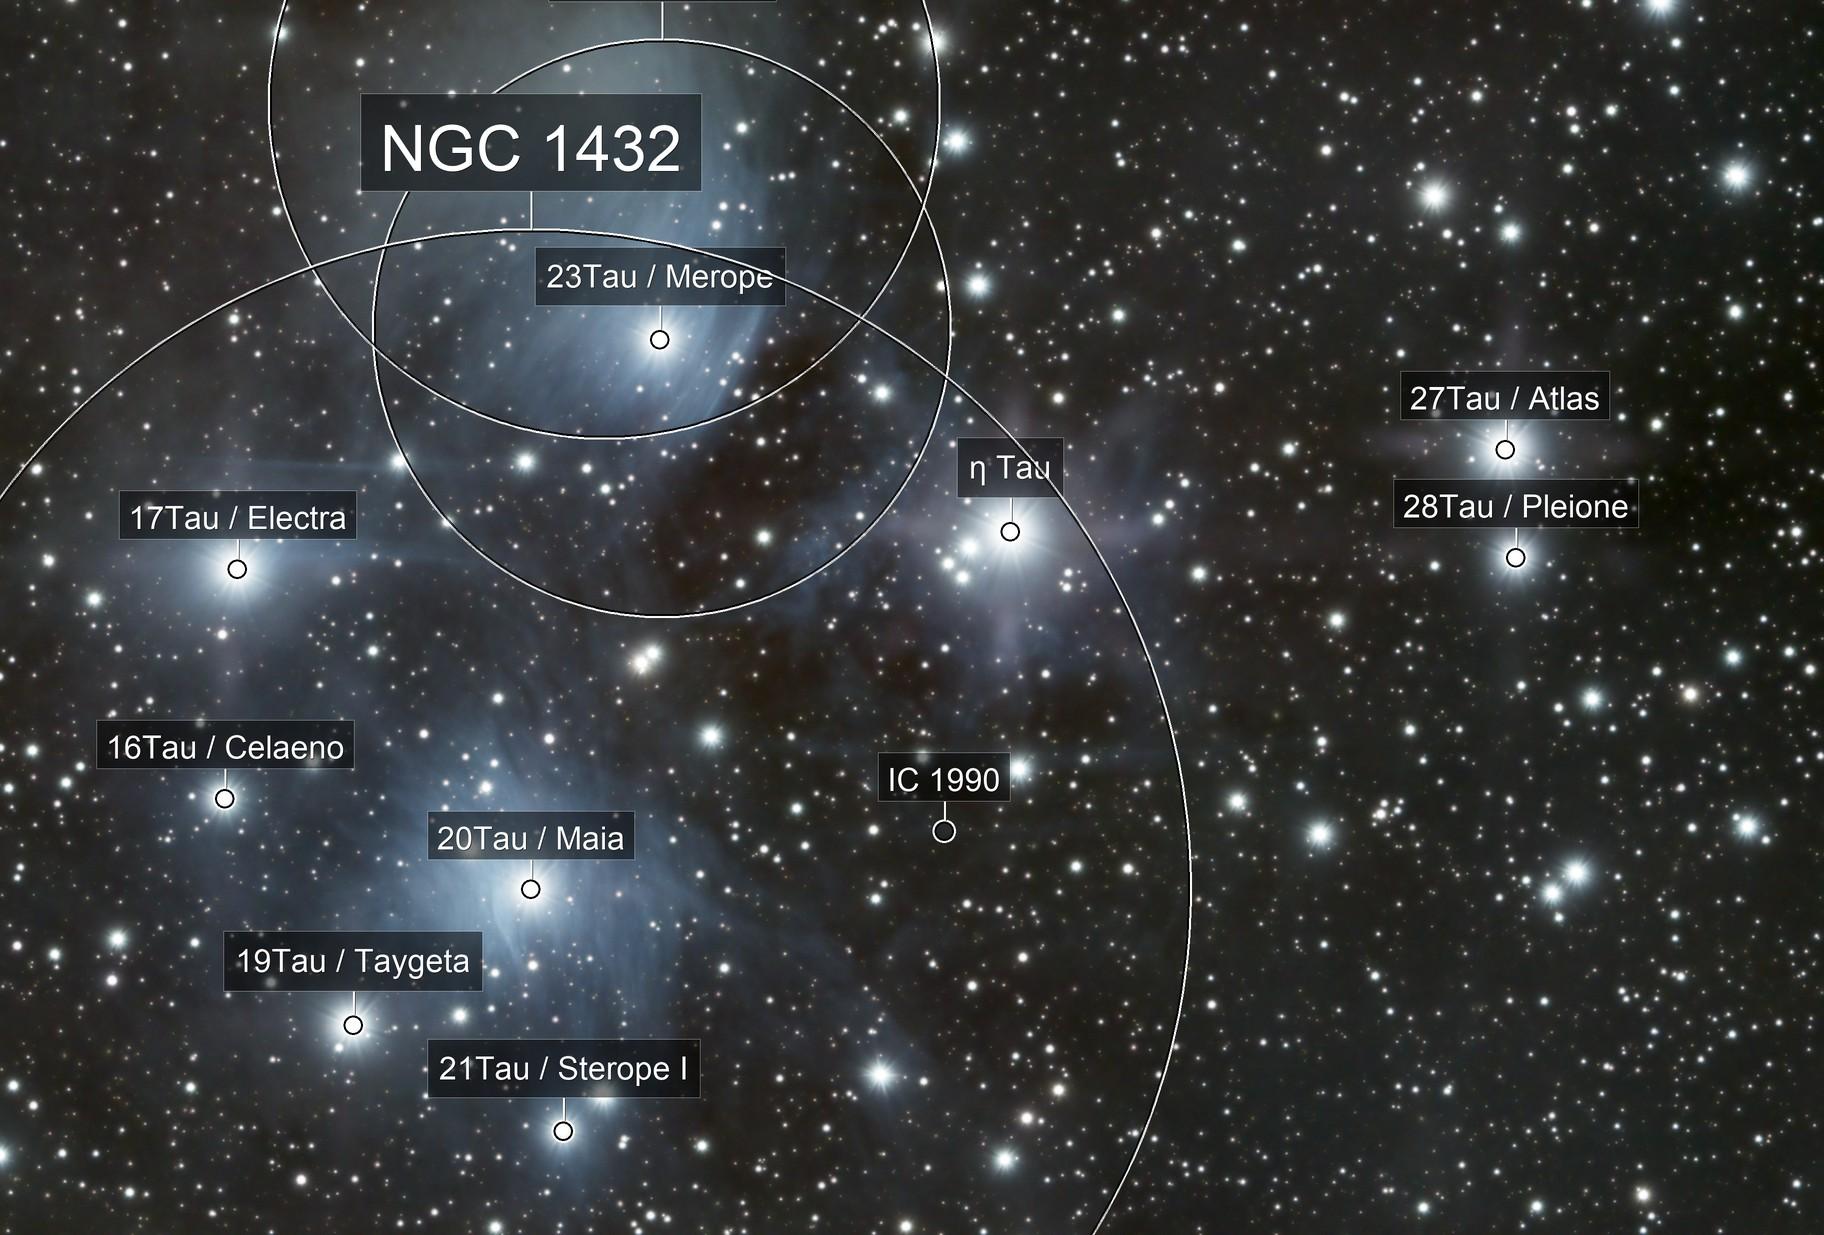 M45 First Light Disaster